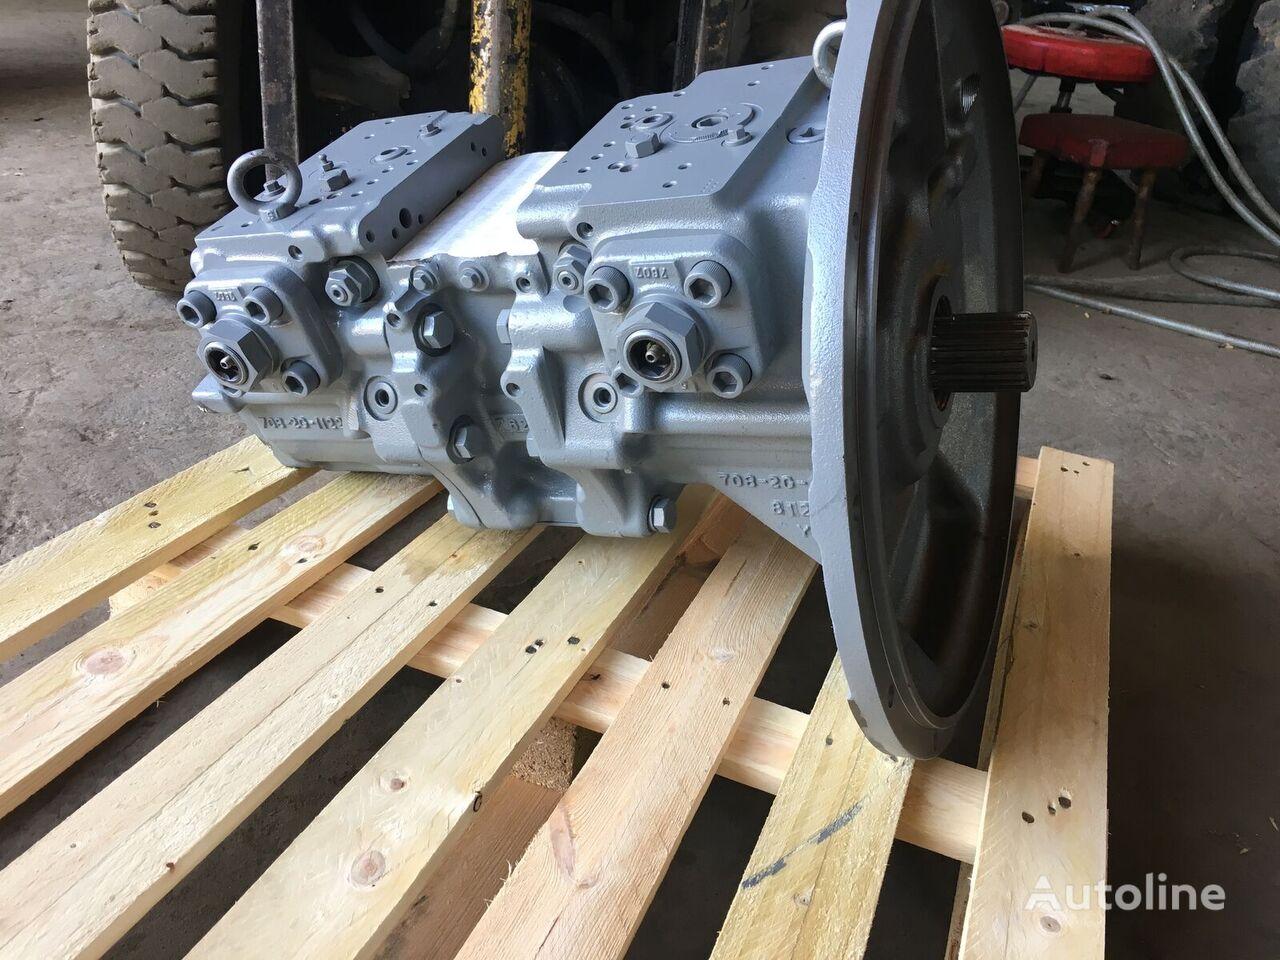 new KOMATSU PC350 7082G00150 hydraulic pump for excavator